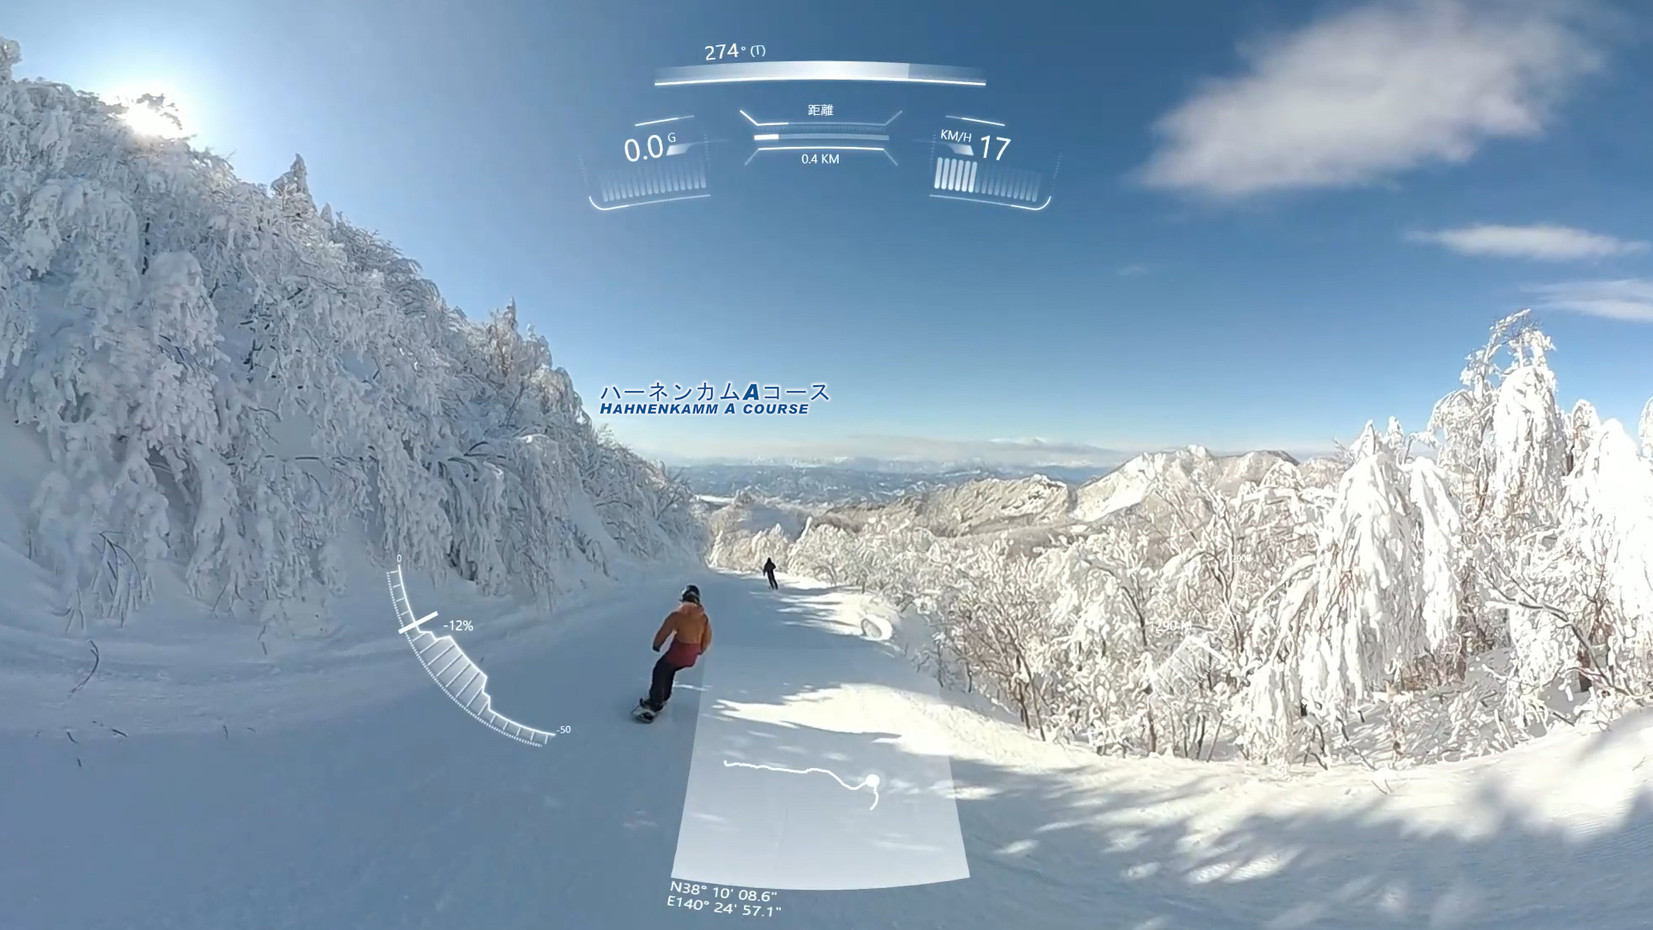 蔵王温泉スキー場 滑走体験VR